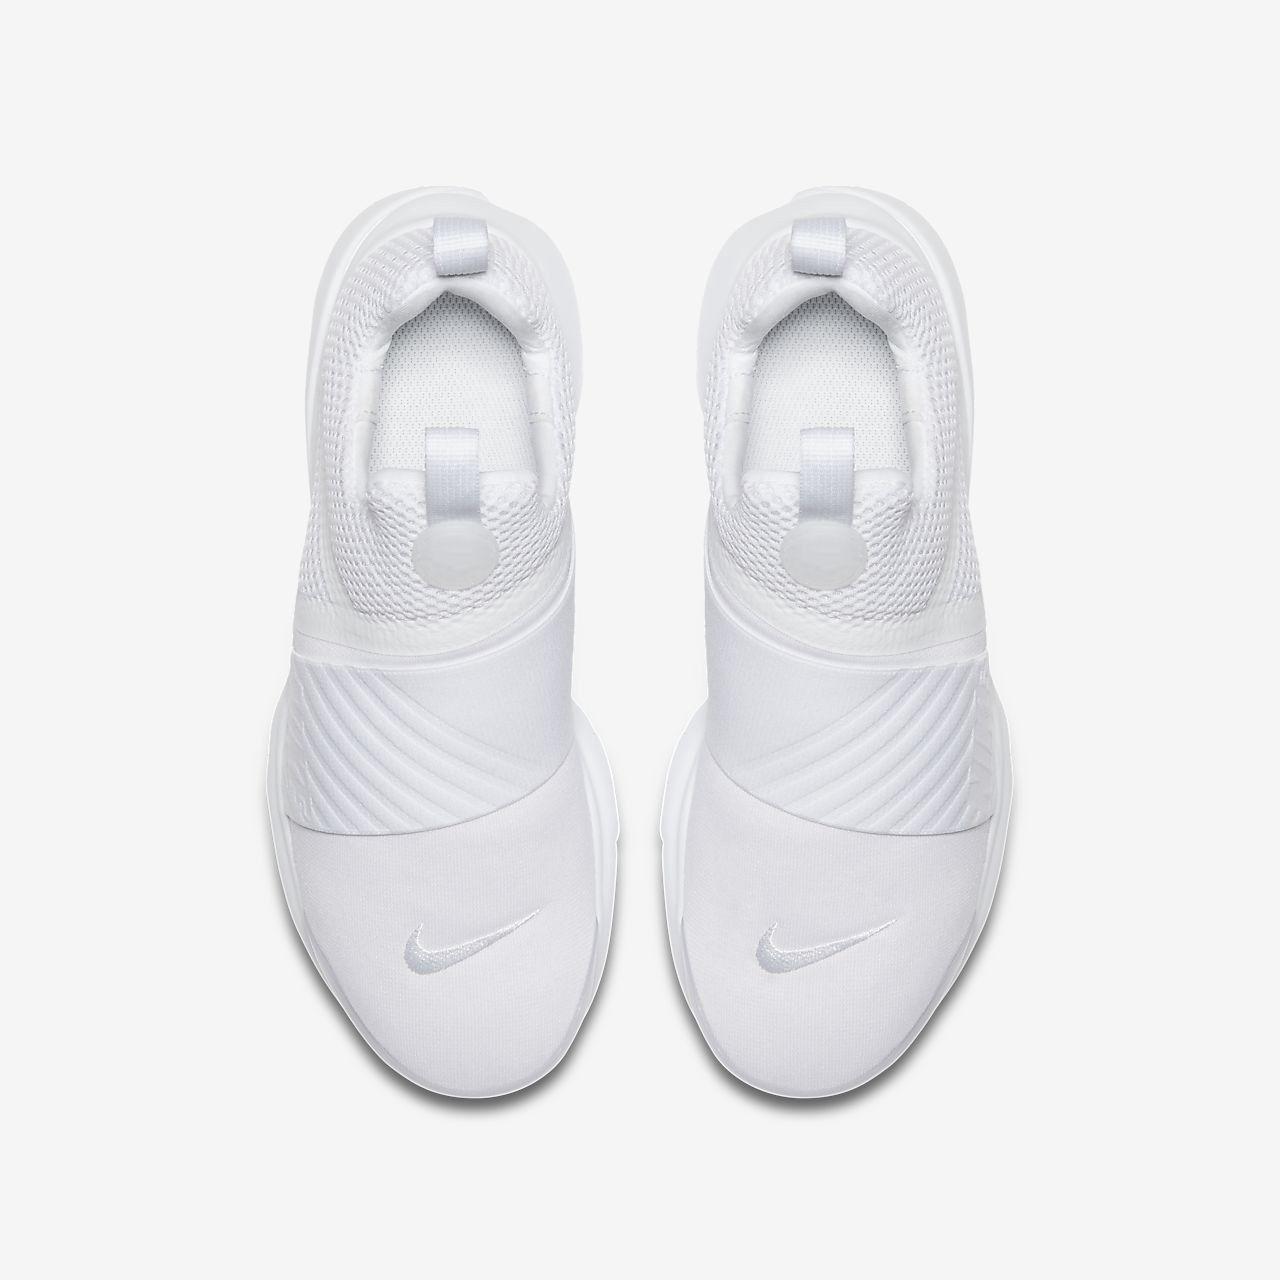 wholesale dealer a2aff 328a1 Nike Presto Extreme Big Kids  Shoe - 4Y